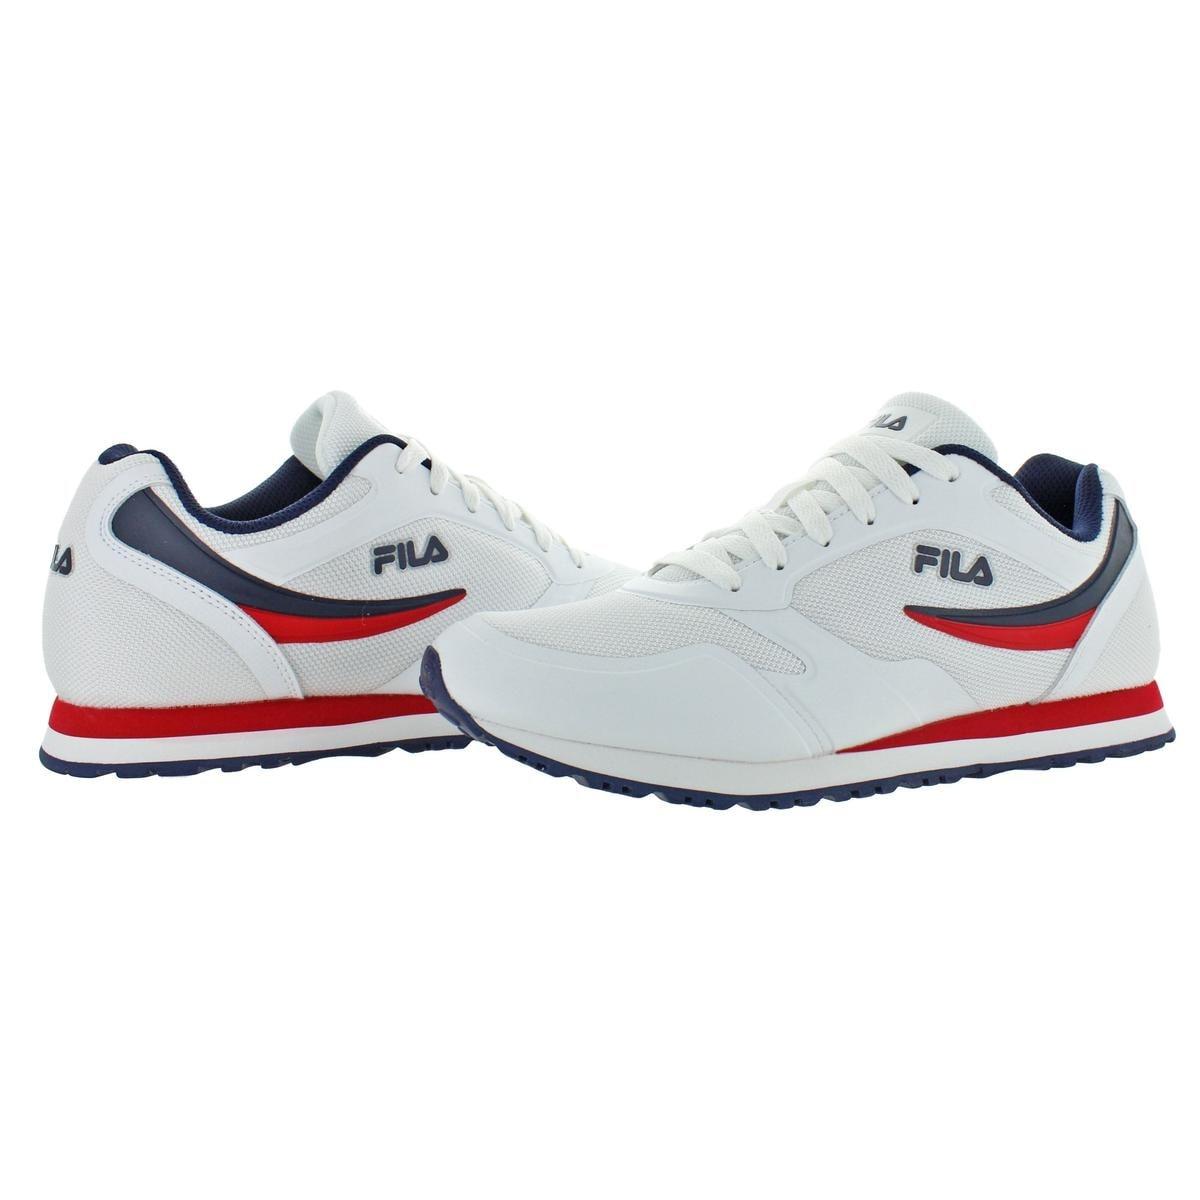 Fila Mens Running Shoes Breathable Mesh